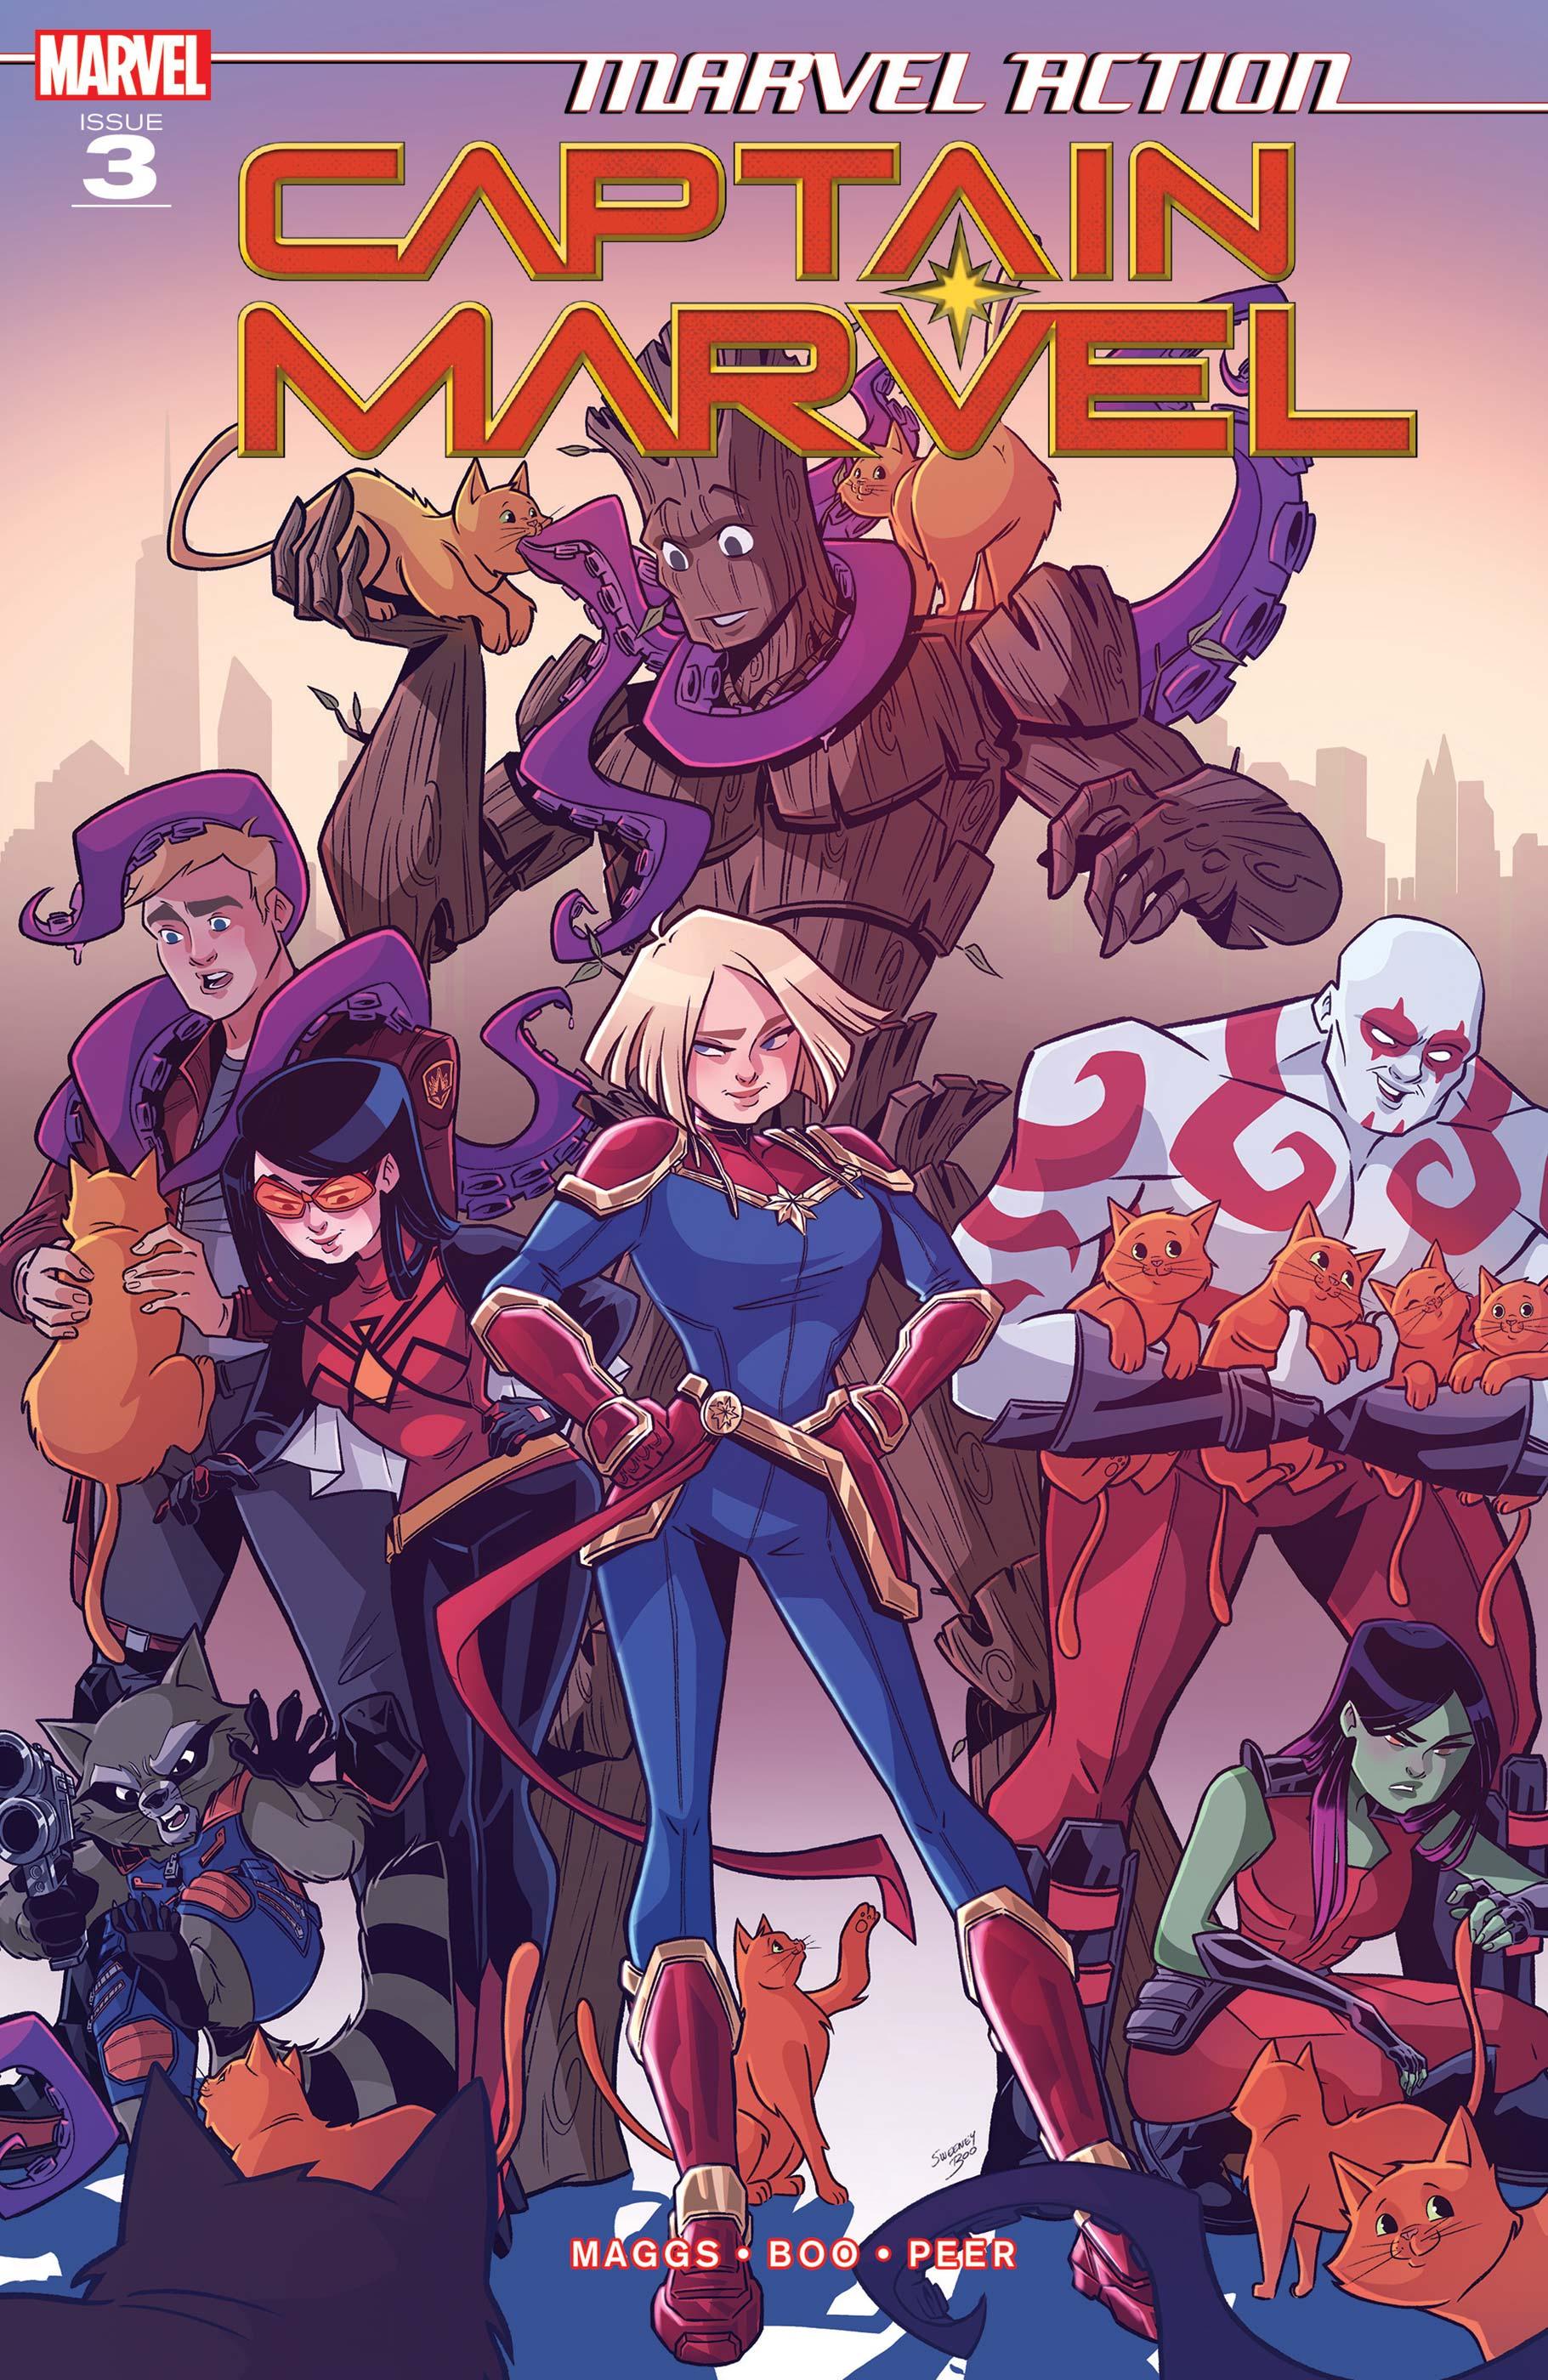 Marvel Action Captain Marvel (2019) #3